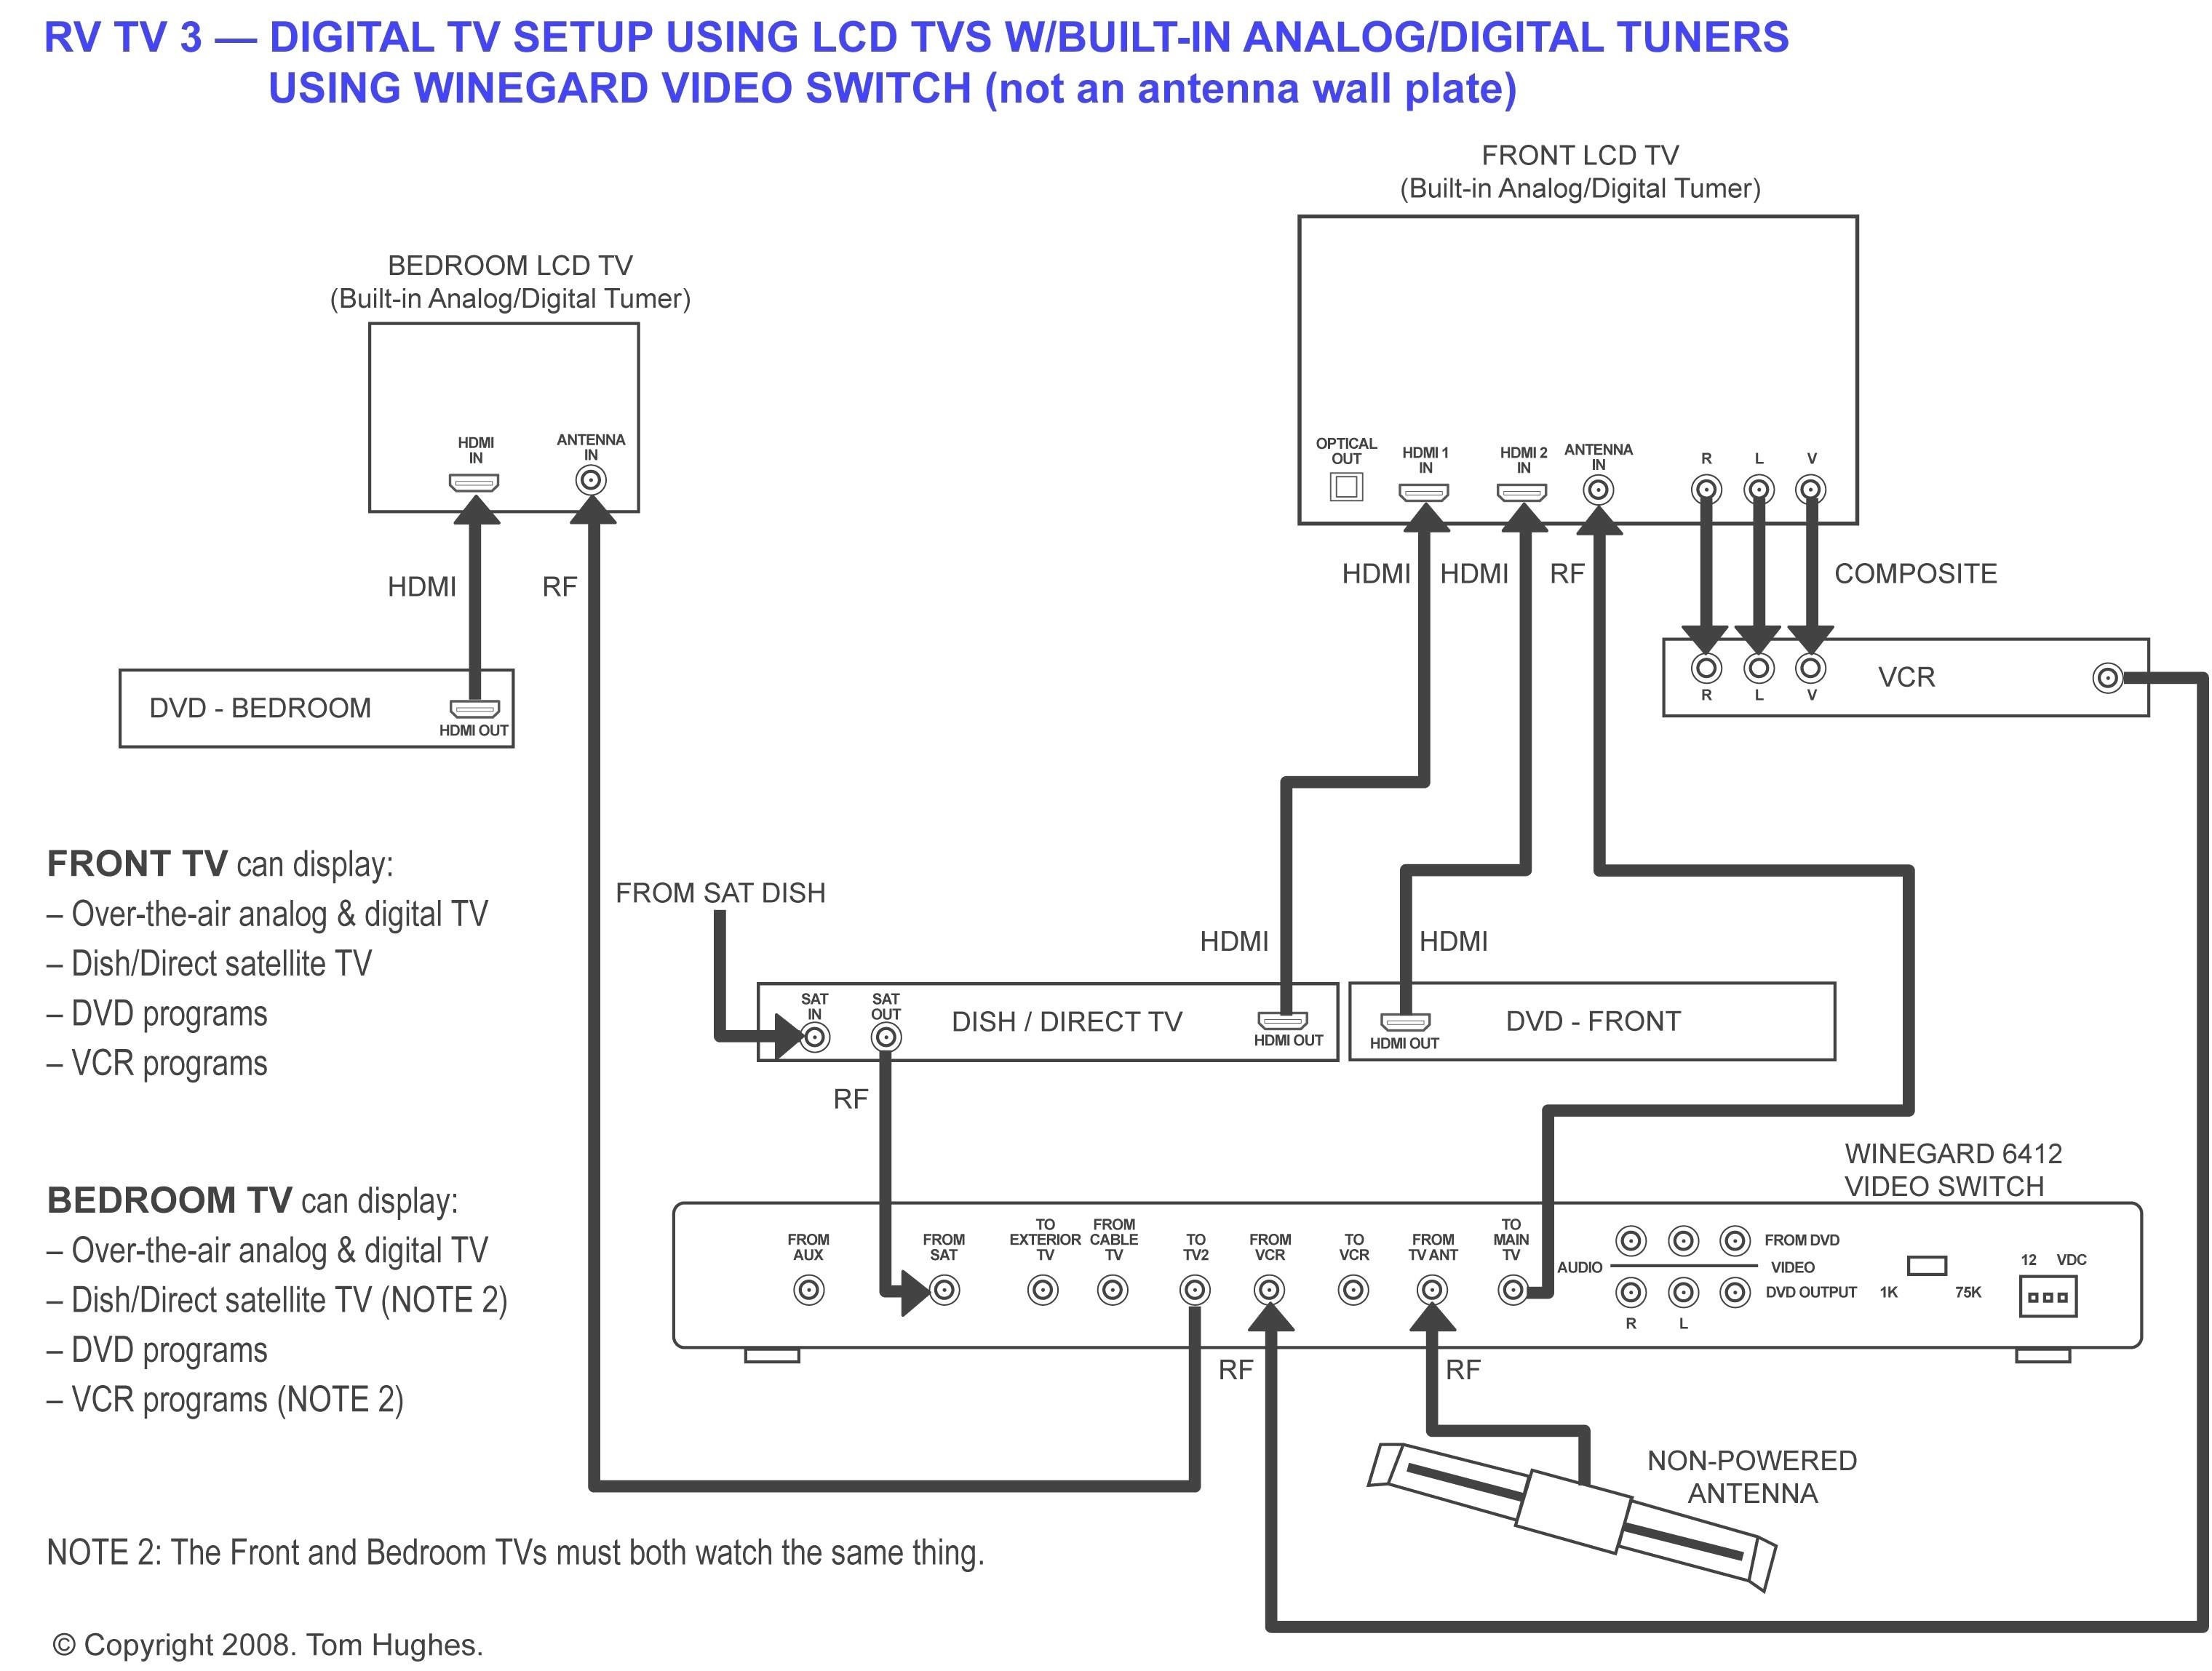 solar panel wiring diagram Collection-Wiring Diagram Qashqai Awesome Wiring Diagram for Trailer Valid Http Wikidiyfaqorguk 0 0d 4-j